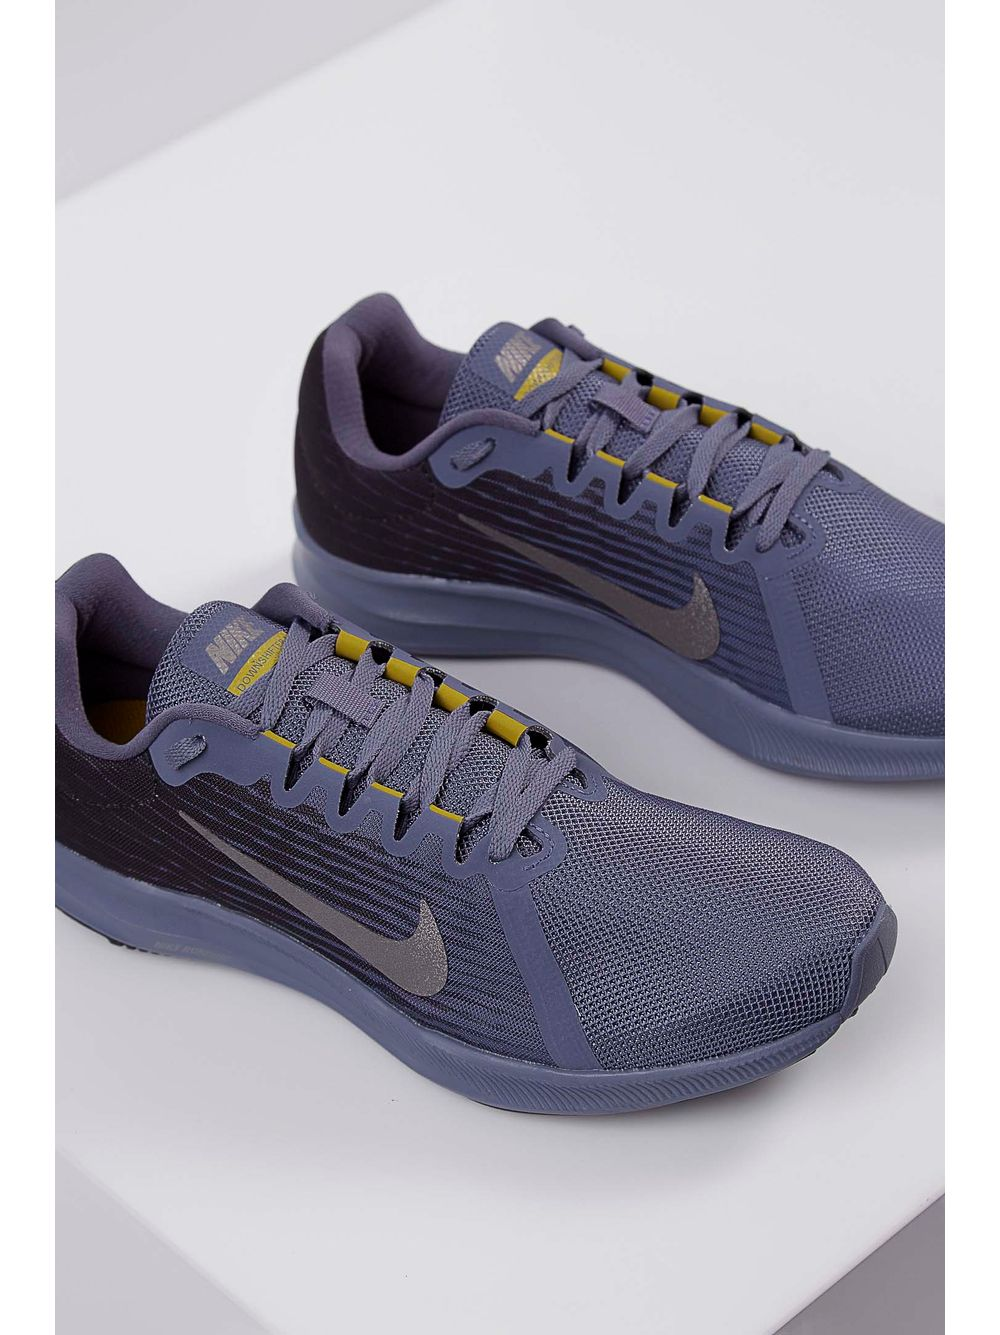 845be19971 Tênis Corrida Nike Downshifter Marinho - pittol